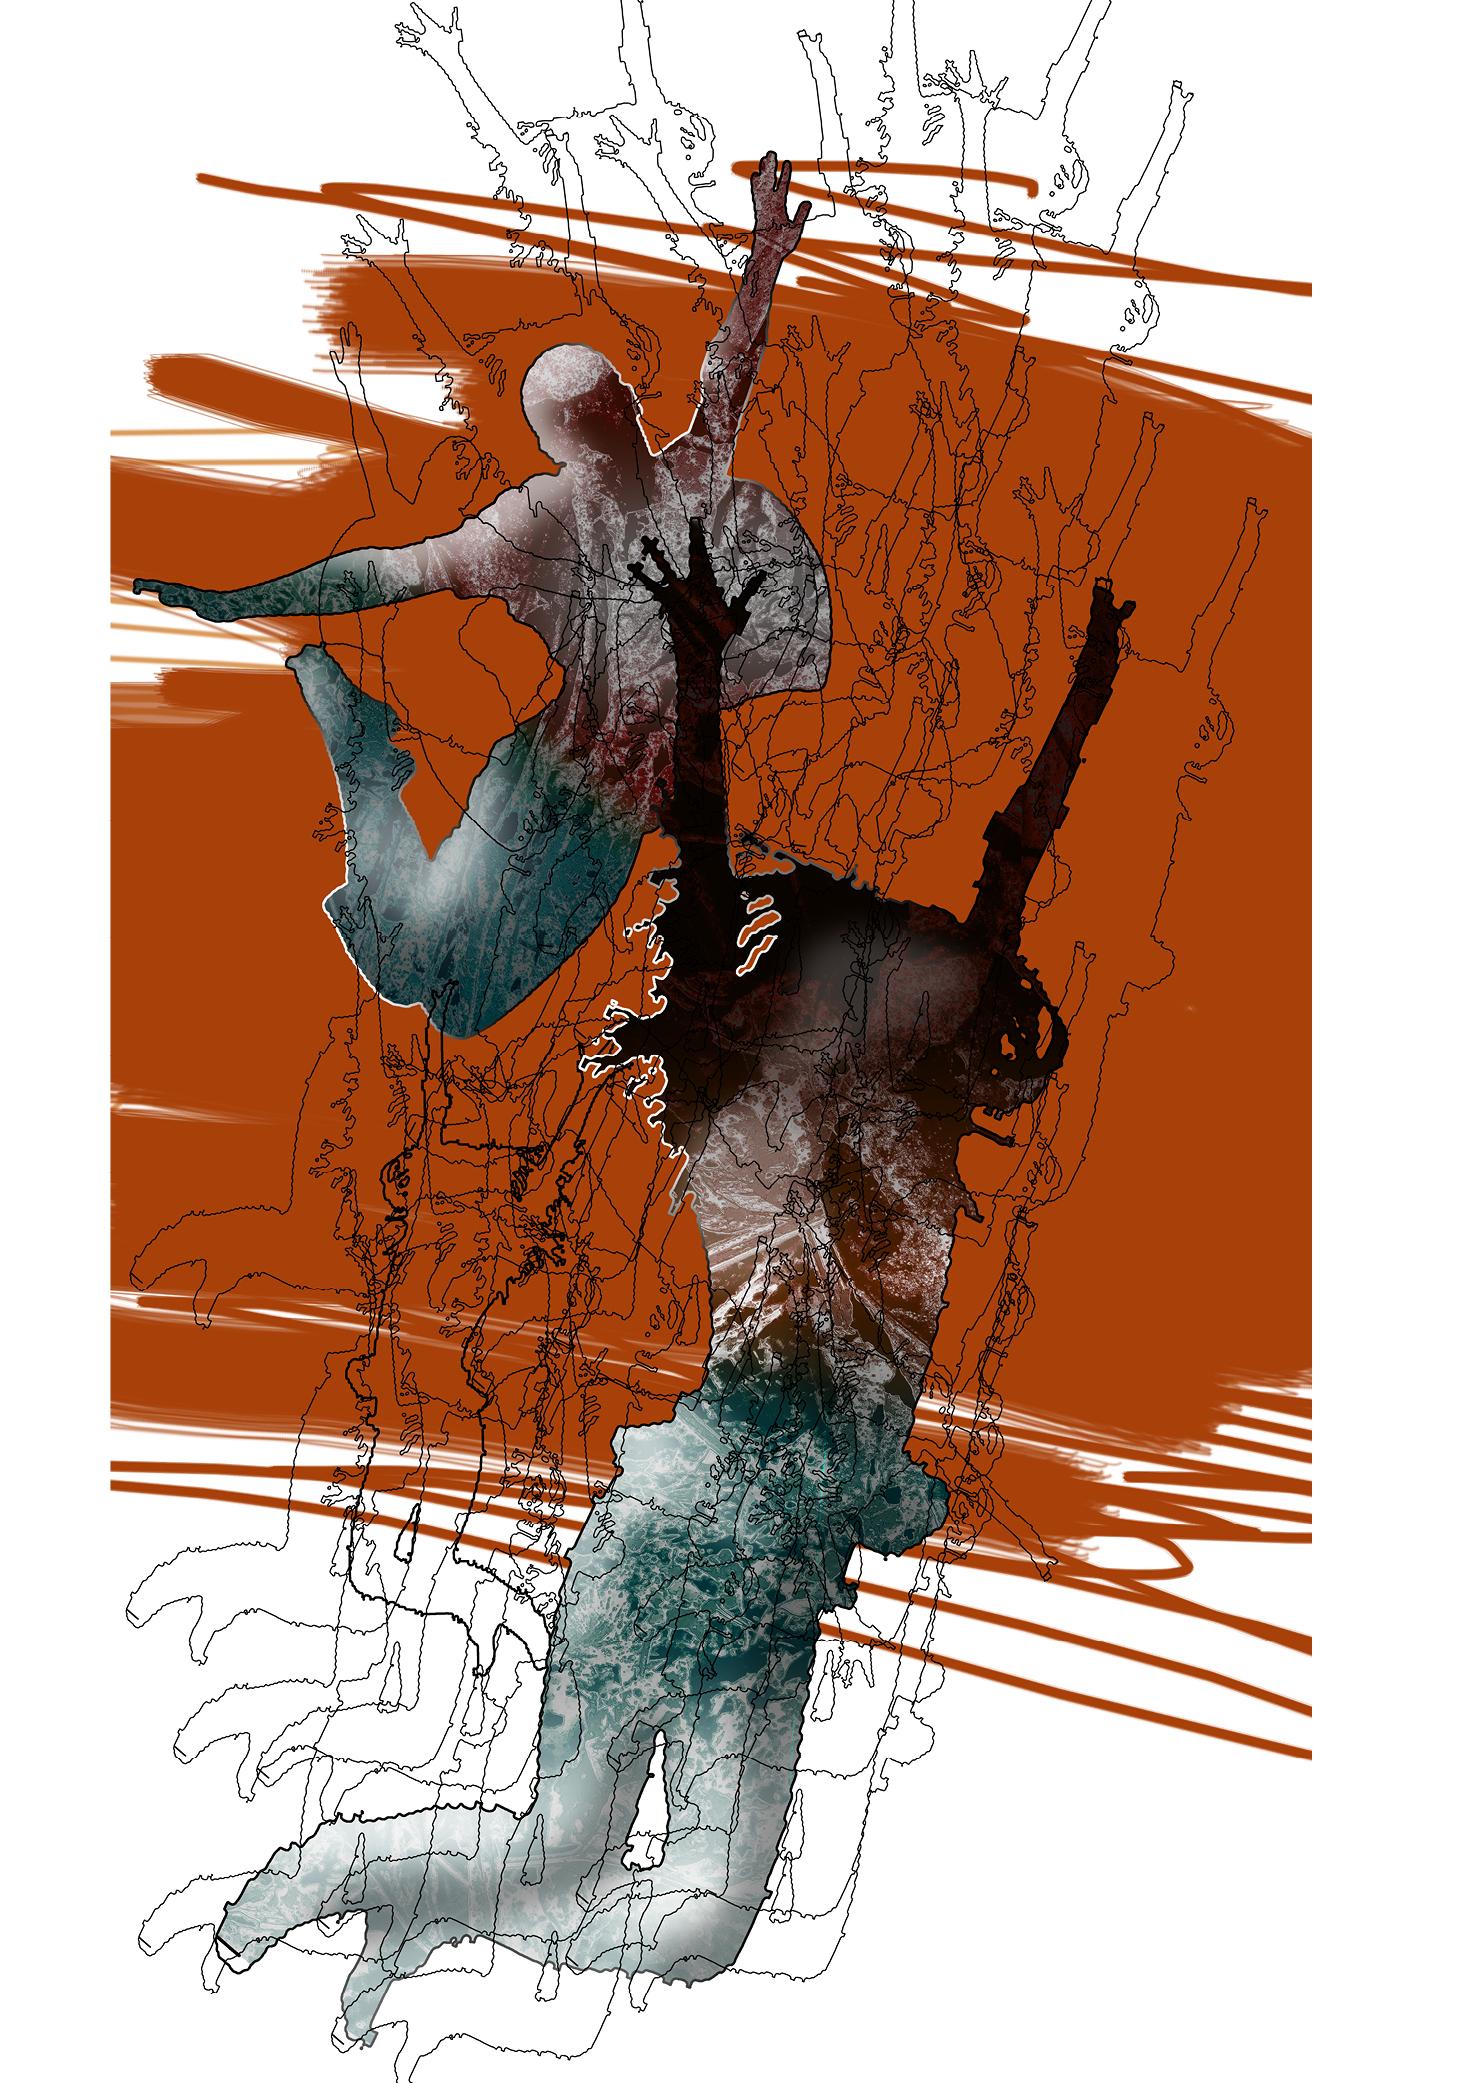 Jumping-I